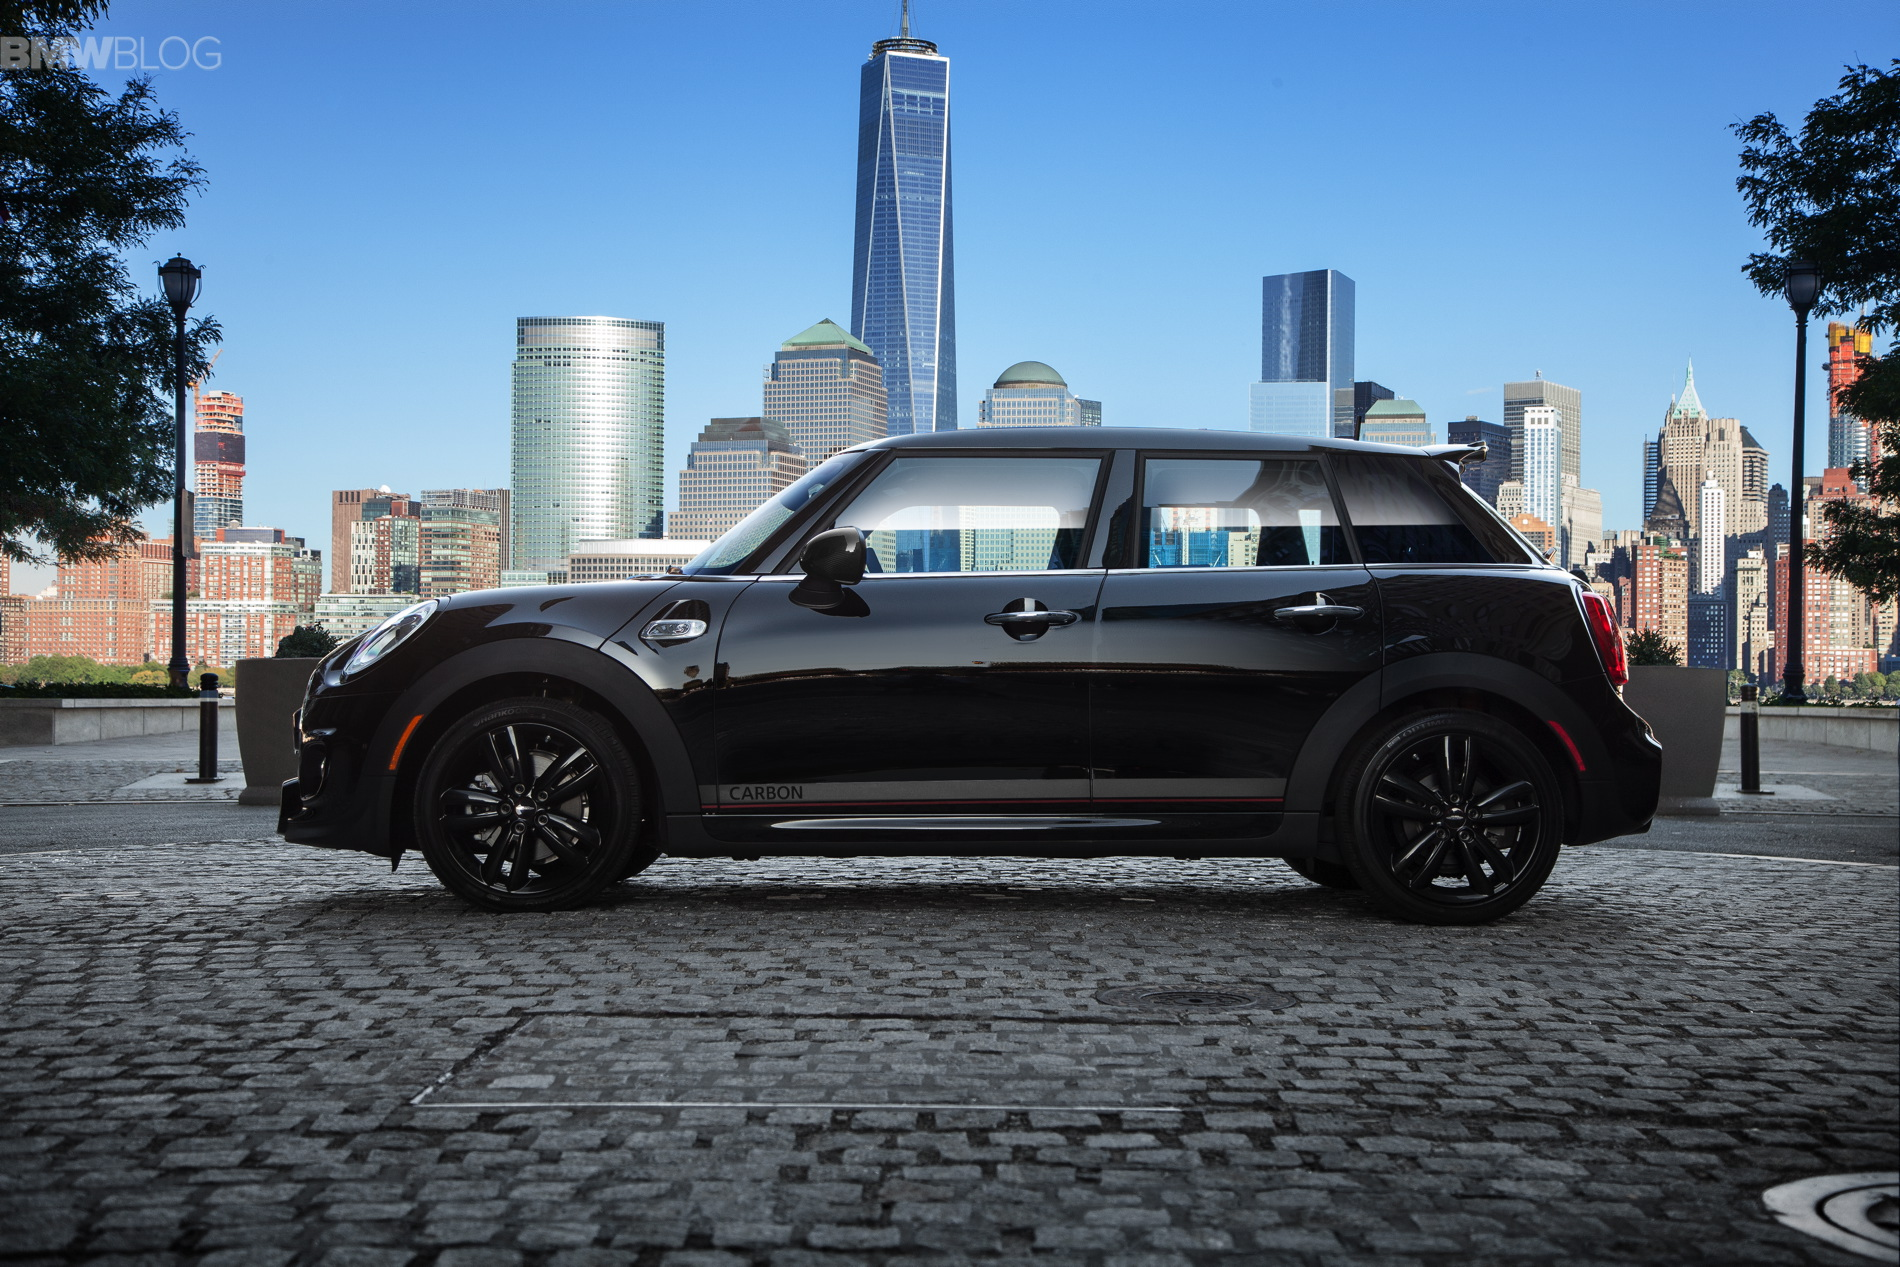 Mini Launches The Cooper S Carbon Edition